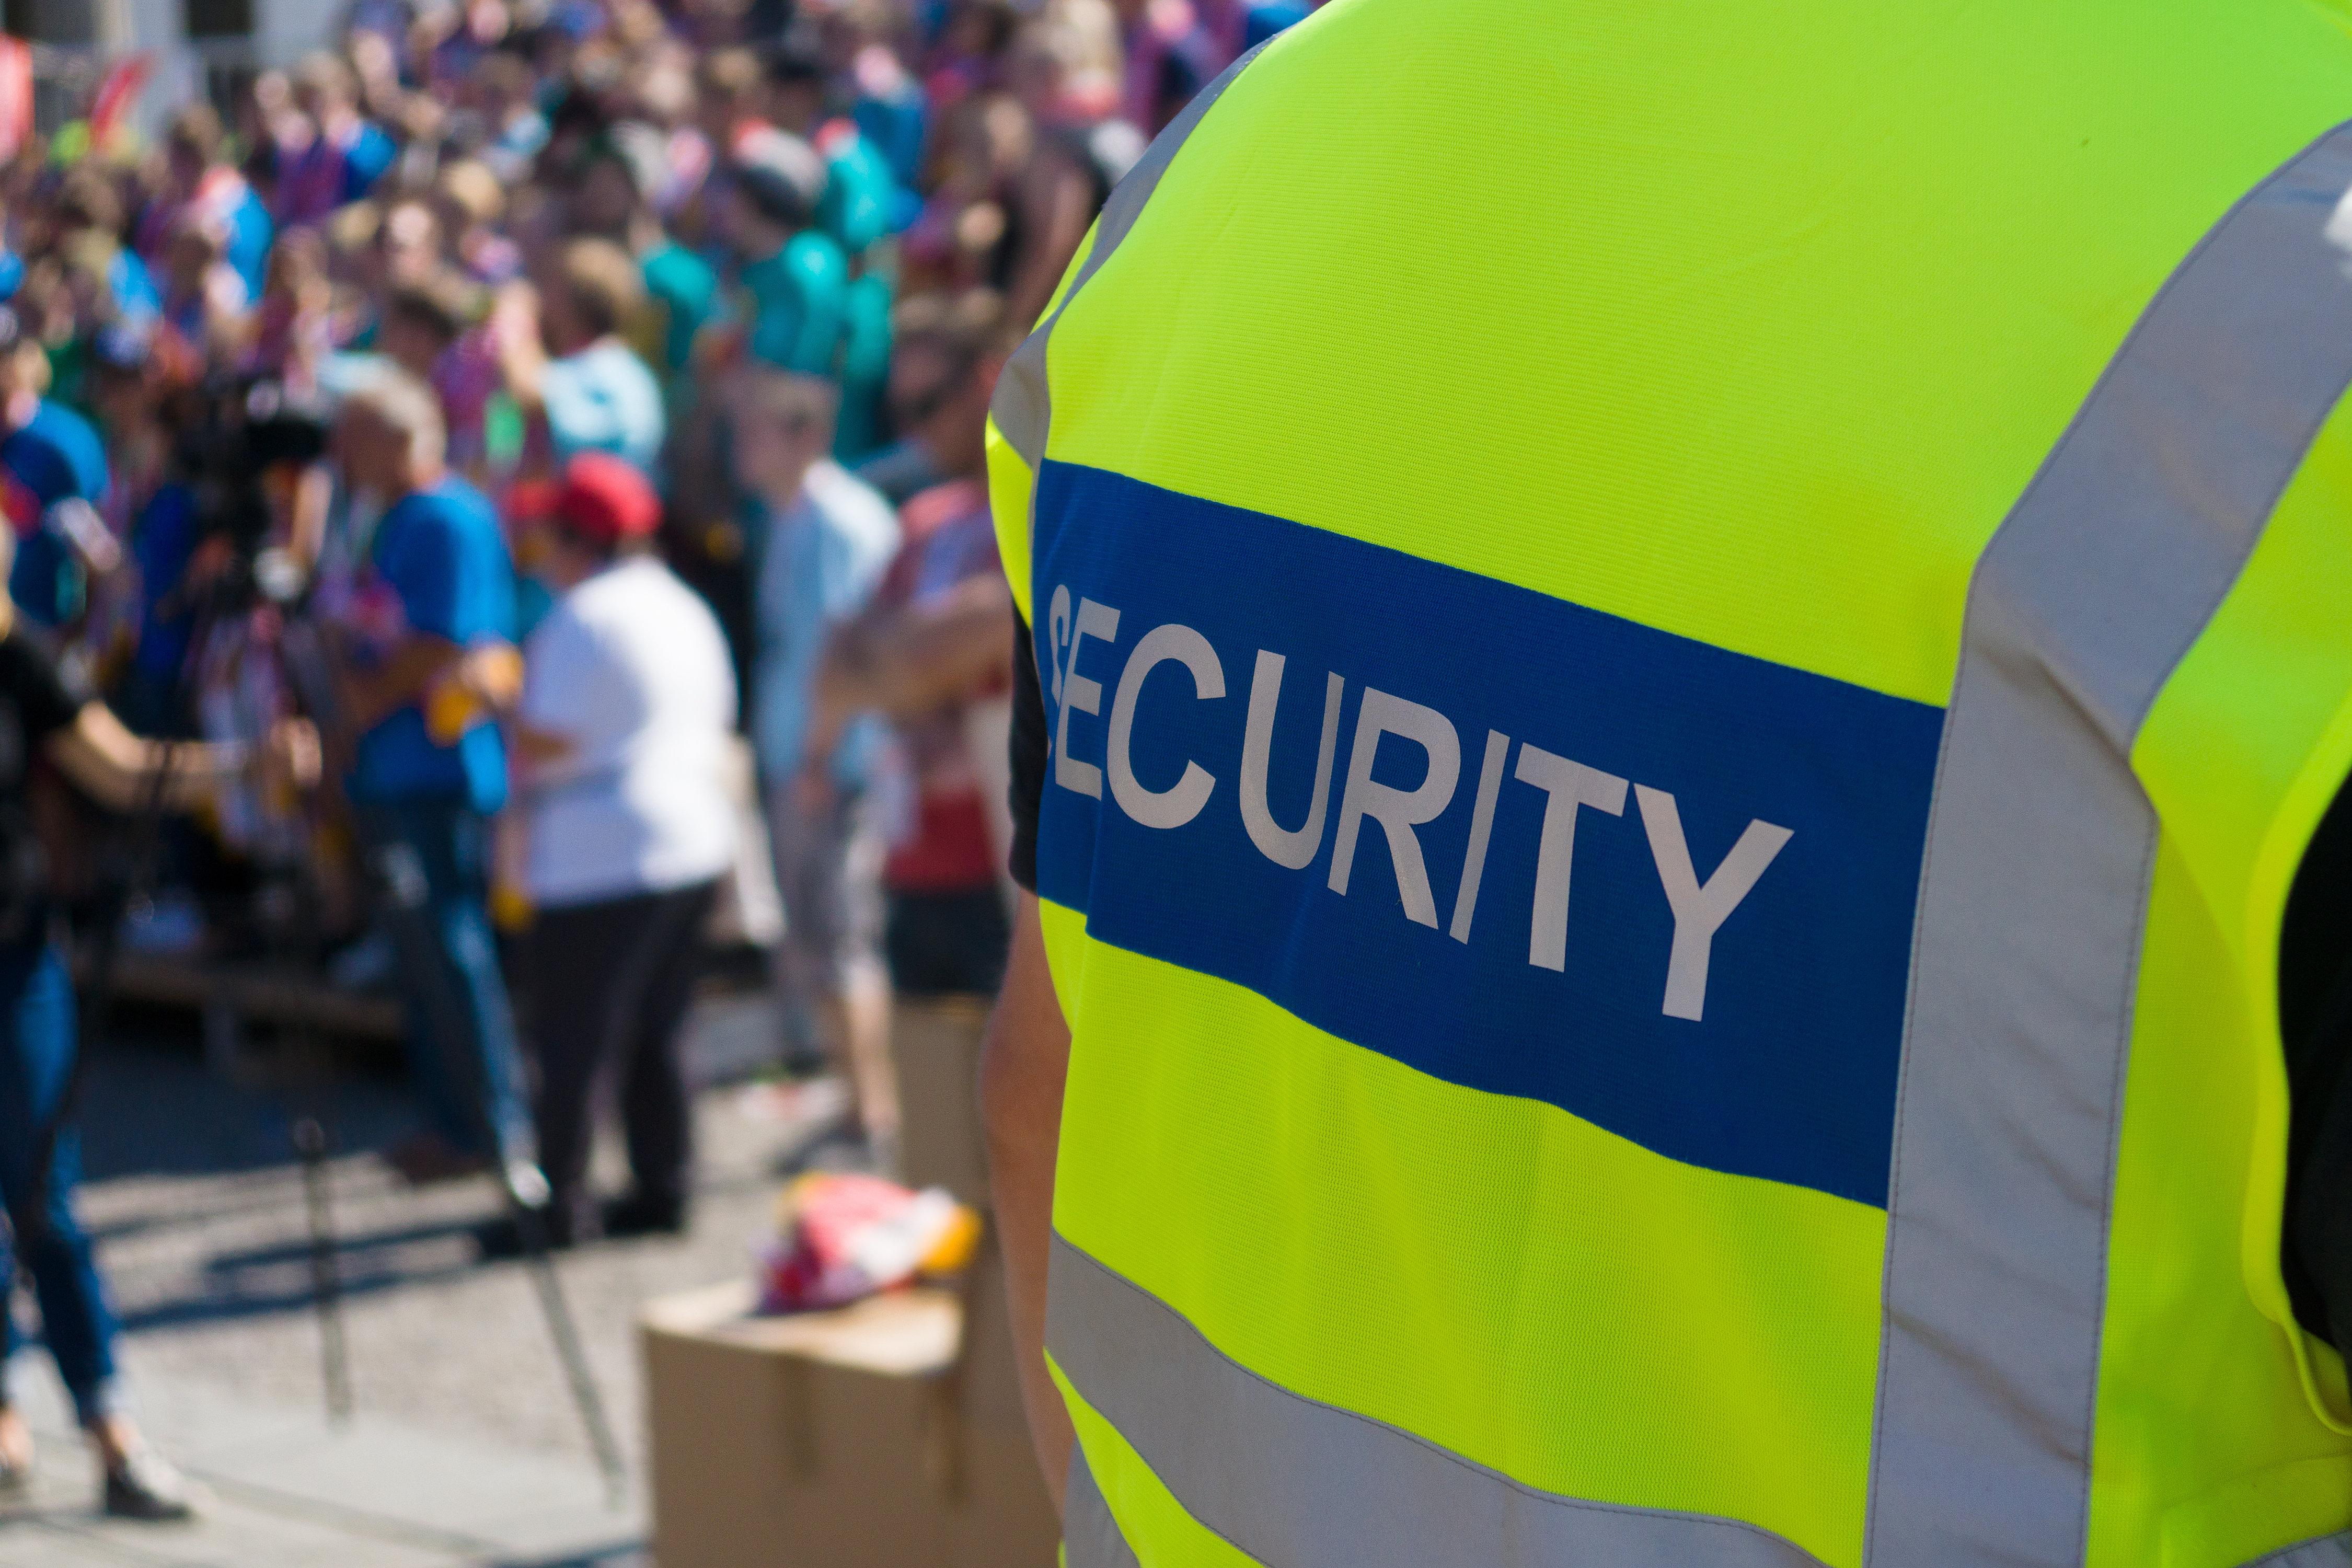 https://0201.nccdn.net/1_2/000/000/186/e7a/jibc-bst-basic-security-training-security-protection-services-ww.jpg